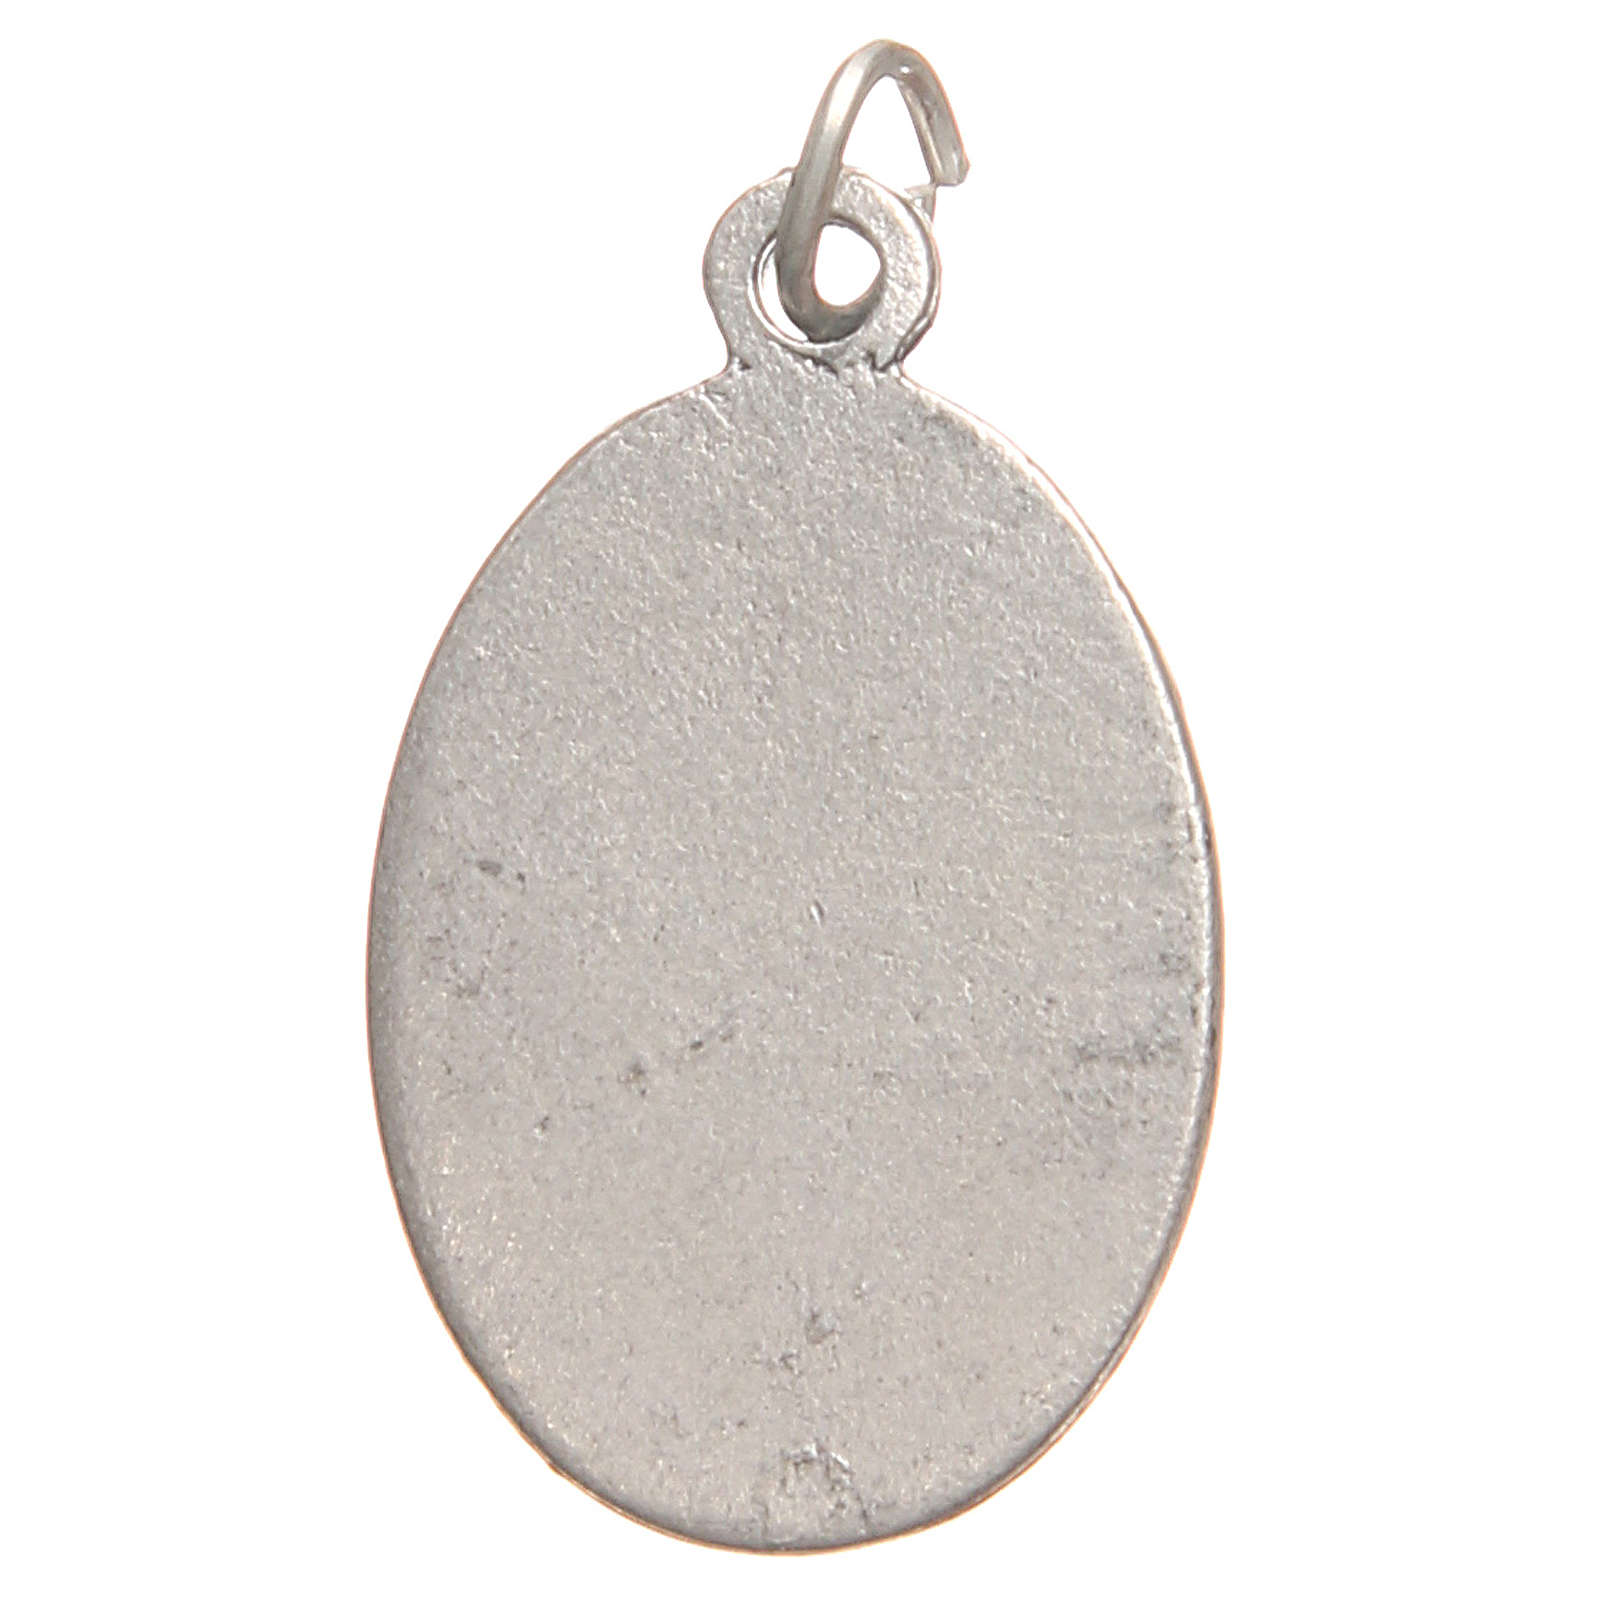 Medaglietta San Faustina galvanica argento antico rosso 2,1 cm 4